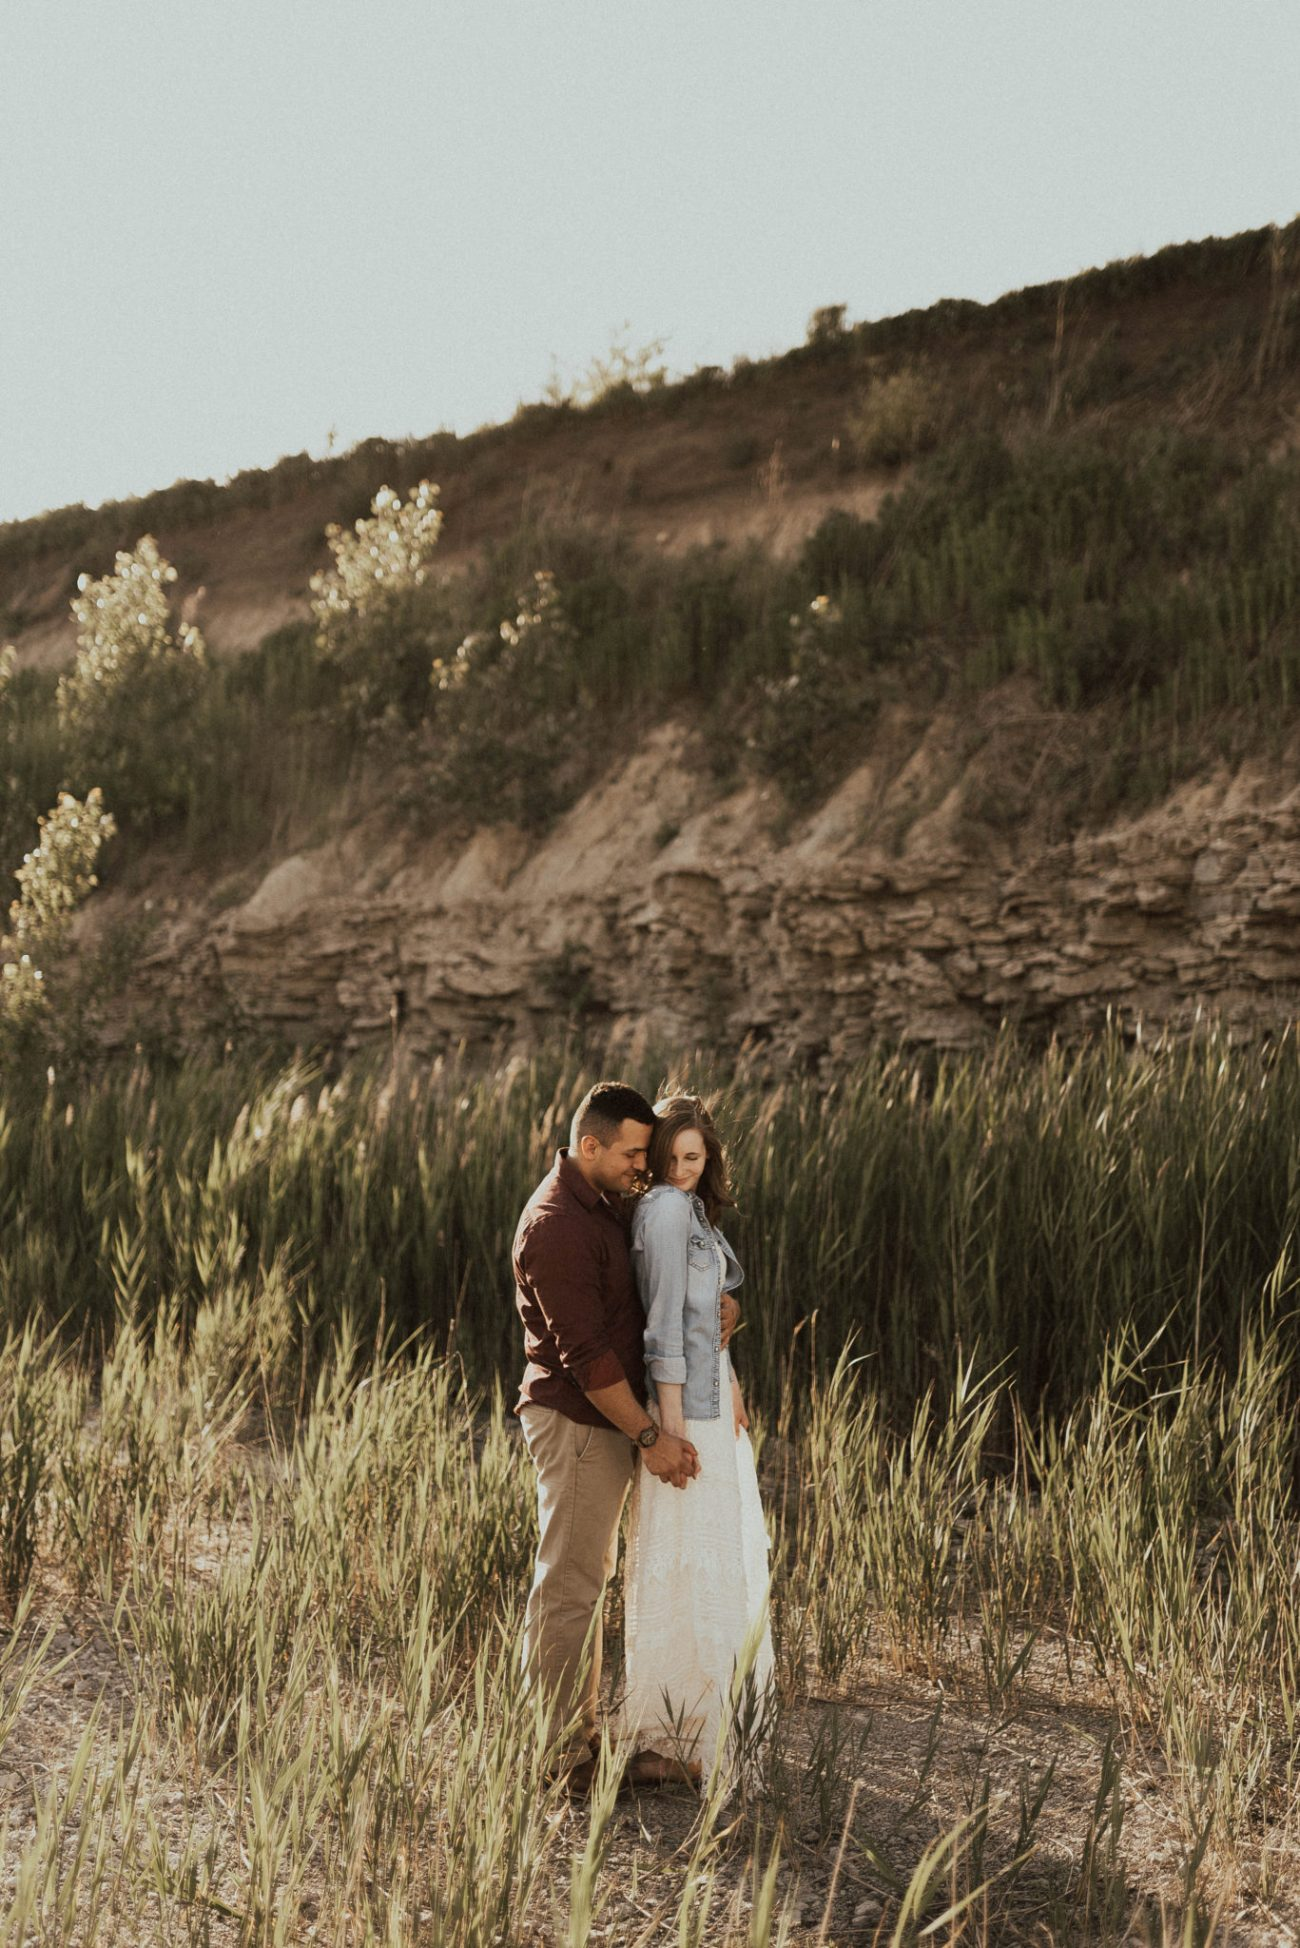 Matt + Sav - Lauren F otography | Central Illinois Wedding